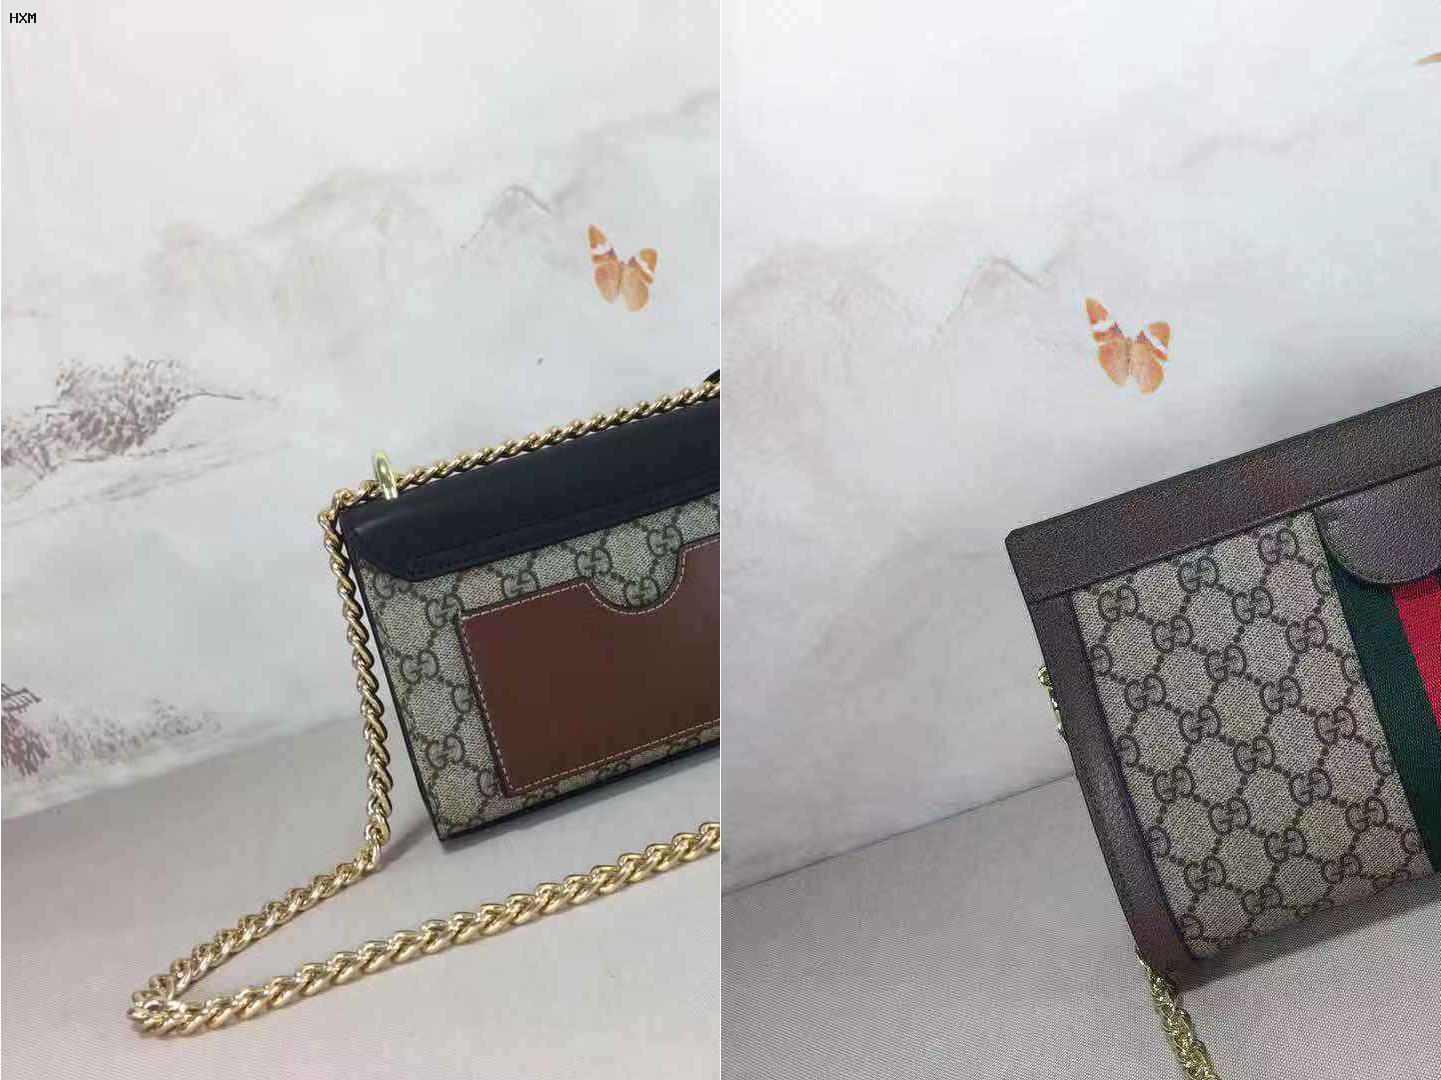 sac gucci avec papillon